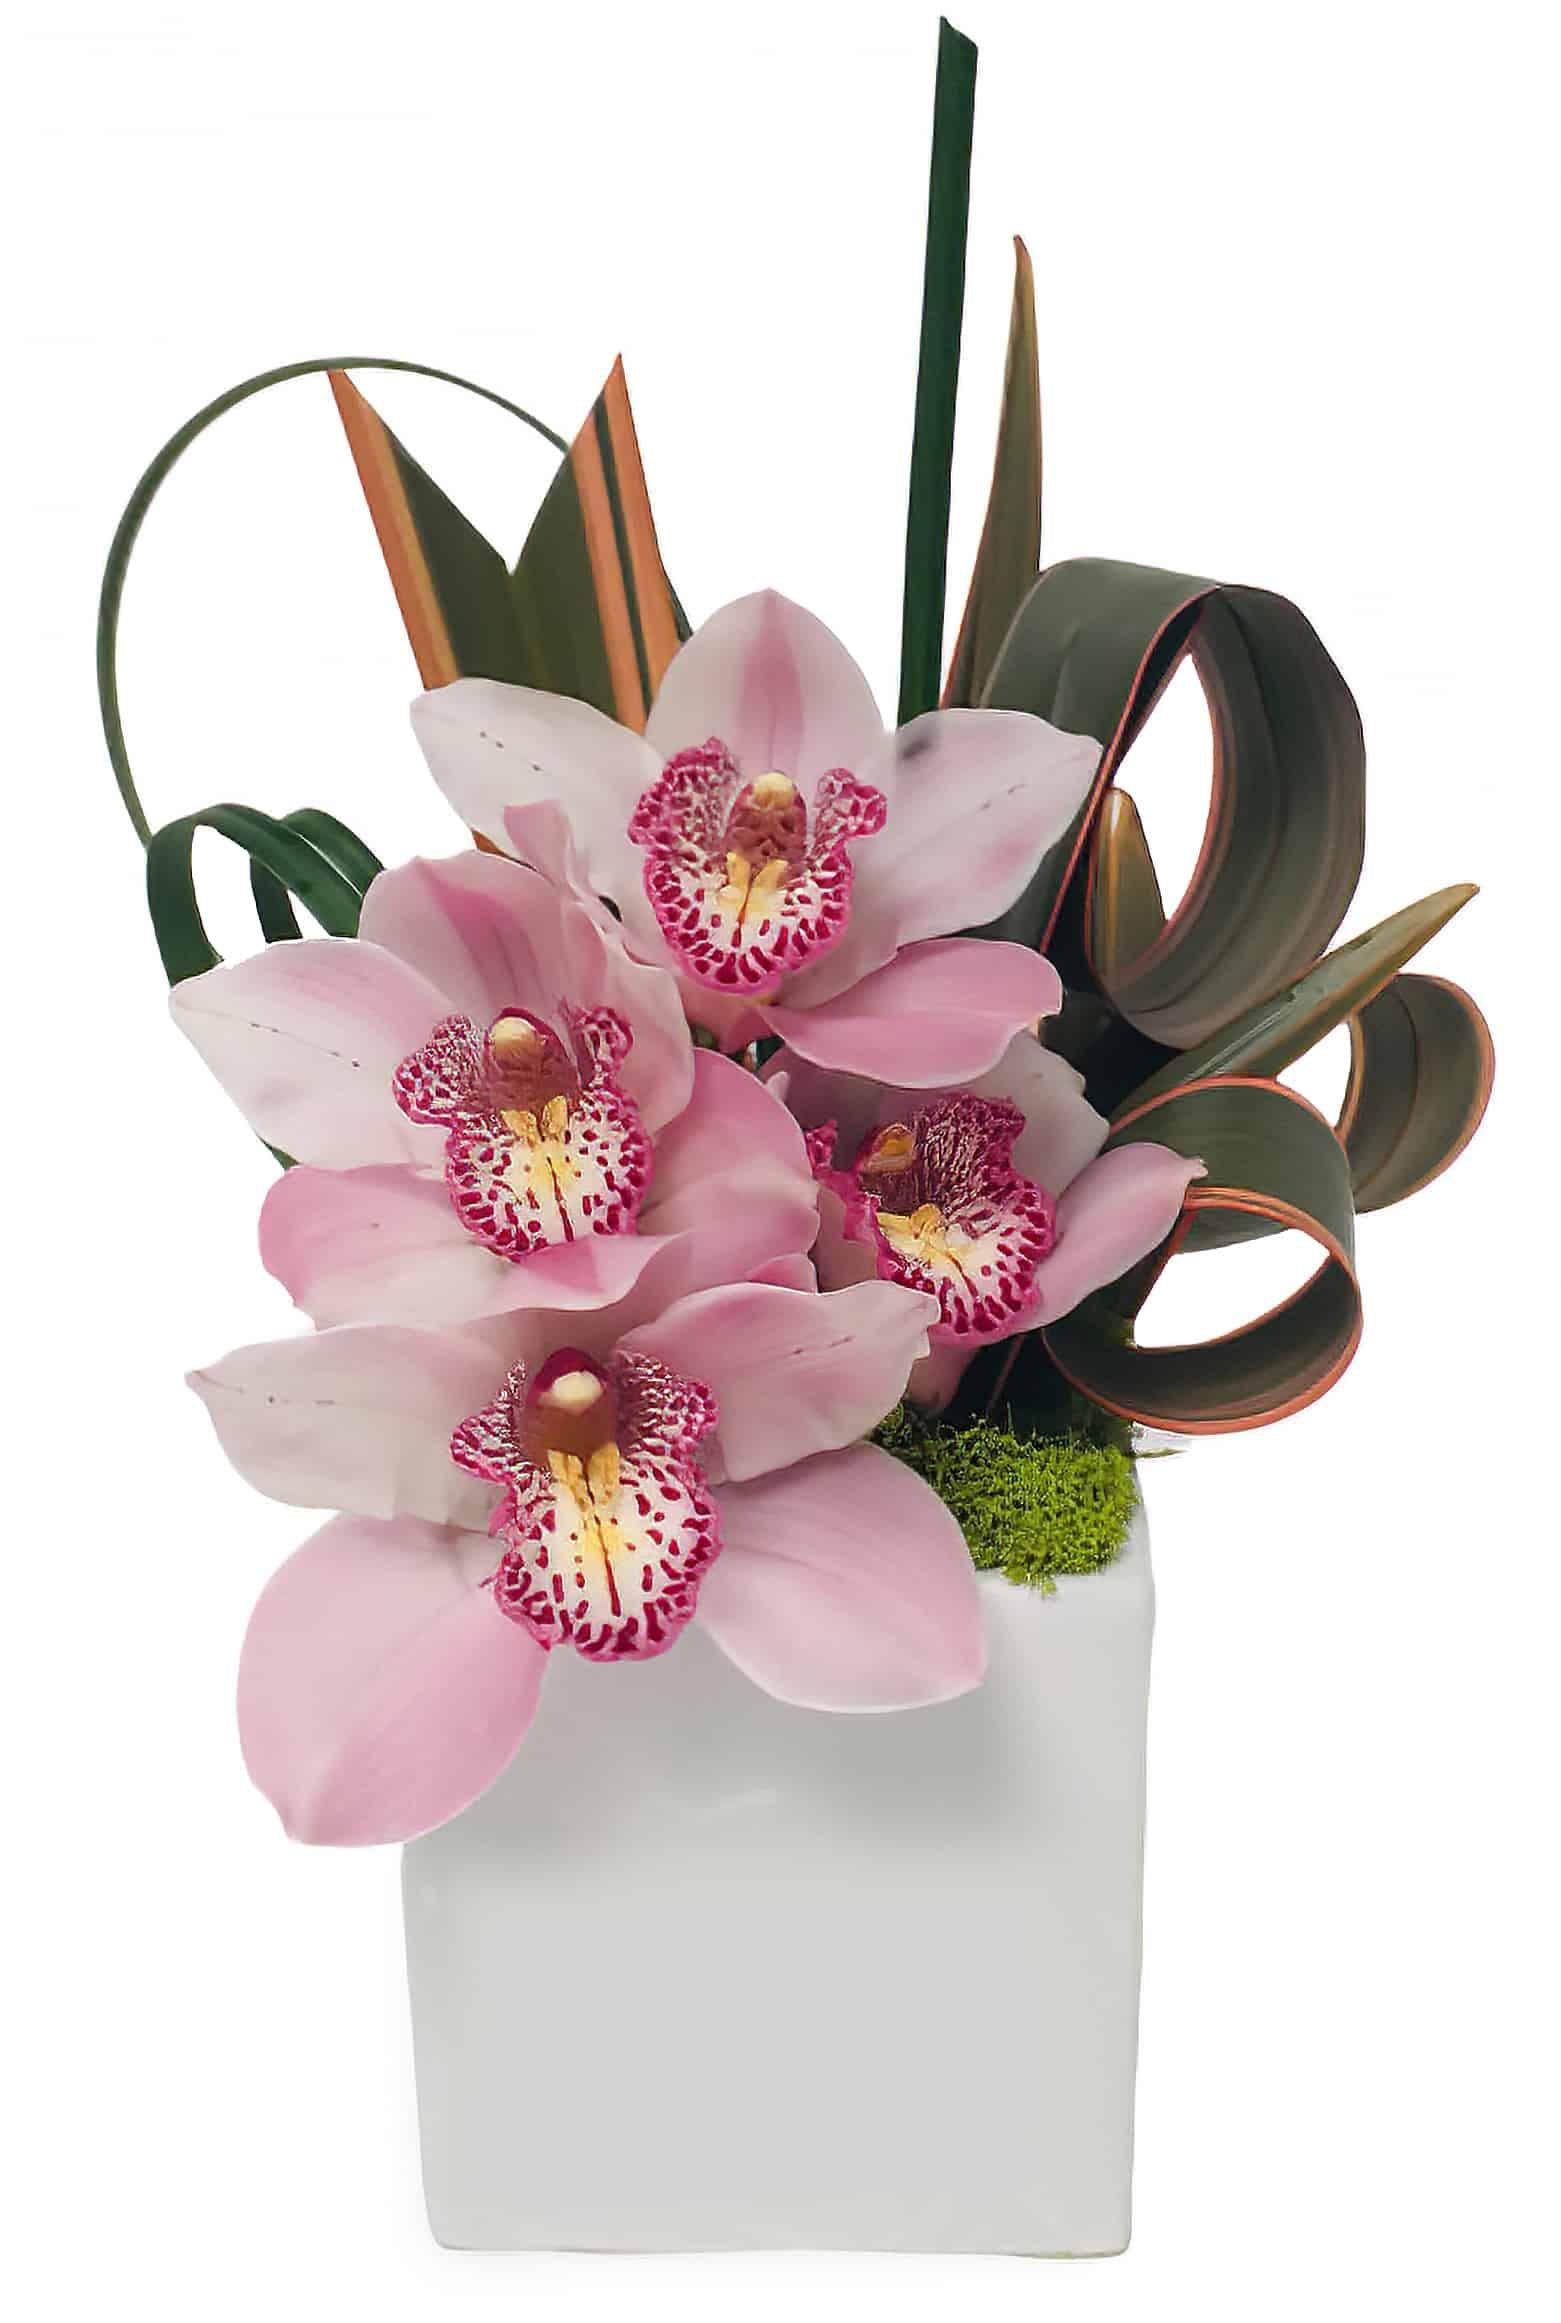 Striped Pink Flower Arrangement | San Francisco Florist Since 1871 Free Bay Area and San Francisco Flower Delivery